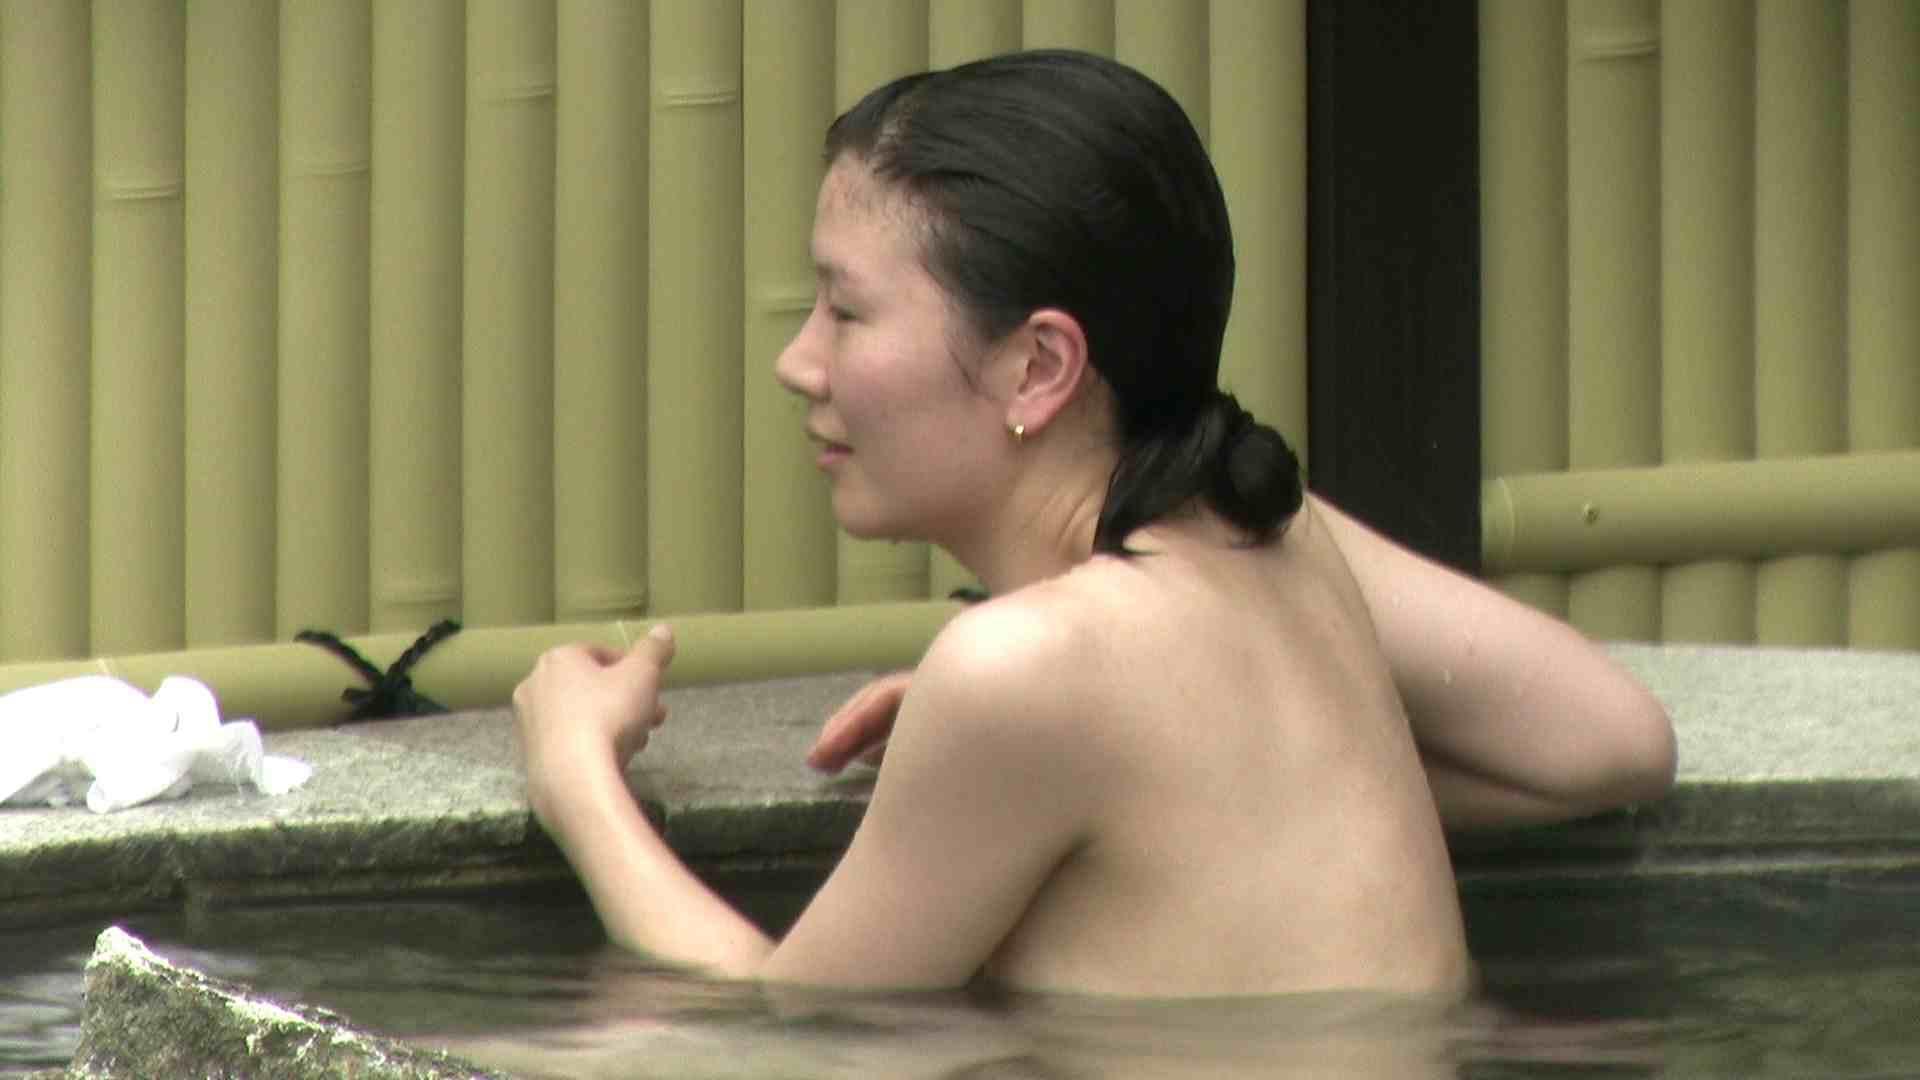 Aquaな露天風呂Vol.187 盗撮  63連発 37